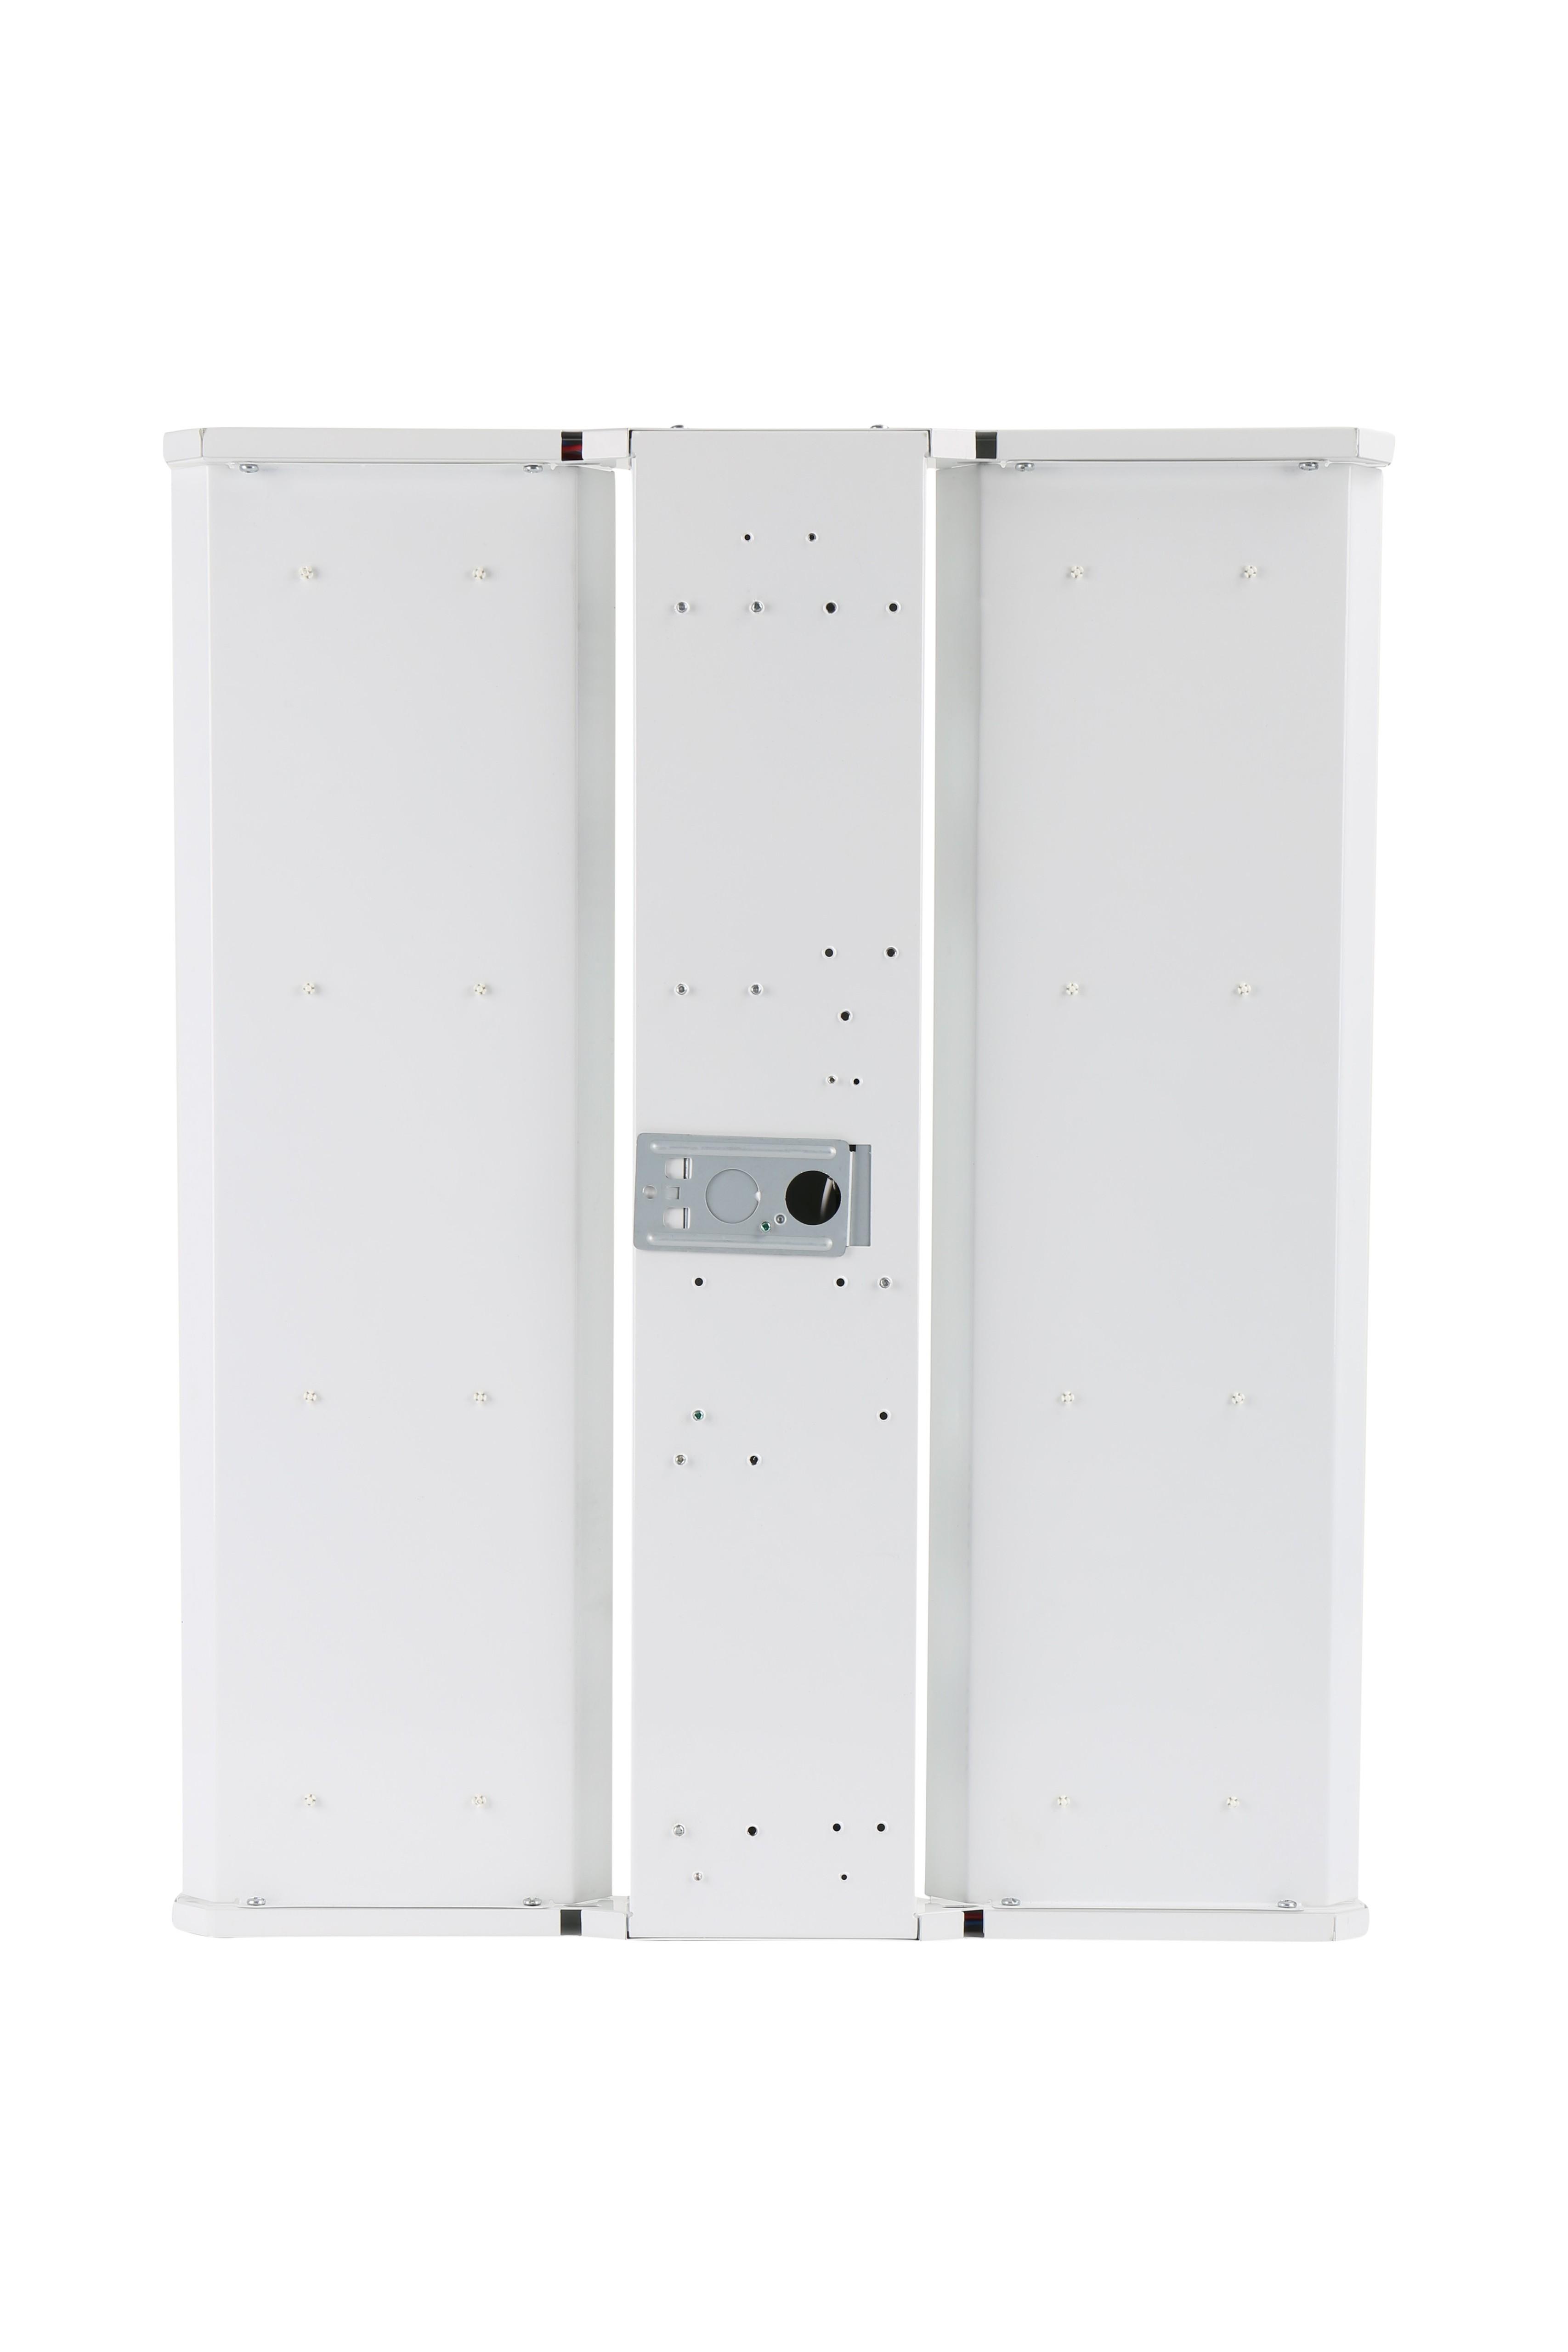 LED Warehouse High Bay With Emergency Battery (90 minute - 900 Lumen), 2' x 2' - 135 Watt, 18,000 Lumens, equivalent to 250W Metal Halide